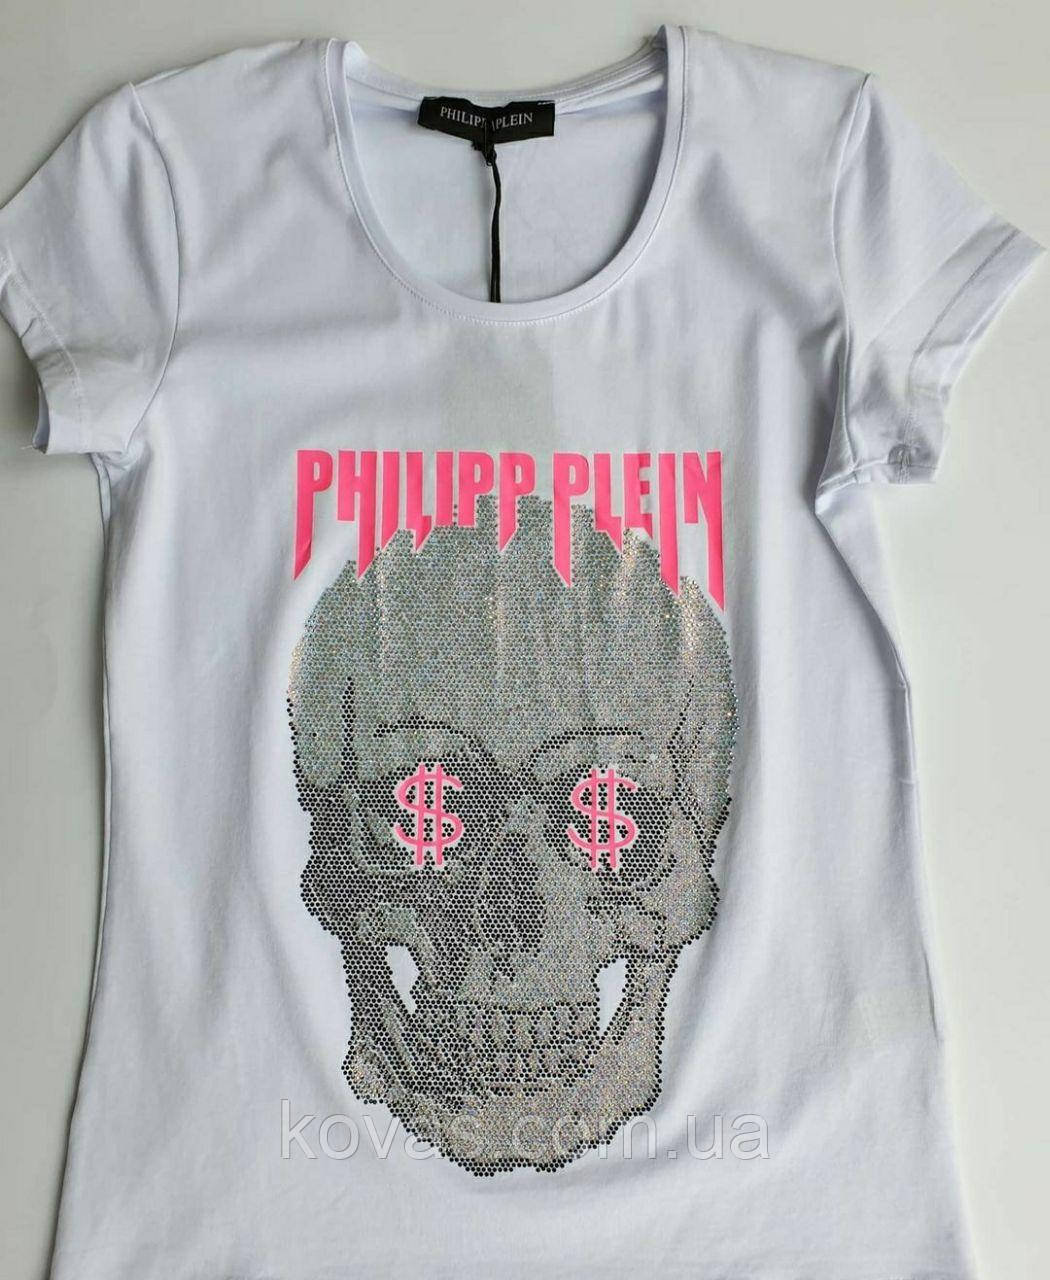 Жіноча футболка Philipp Plein